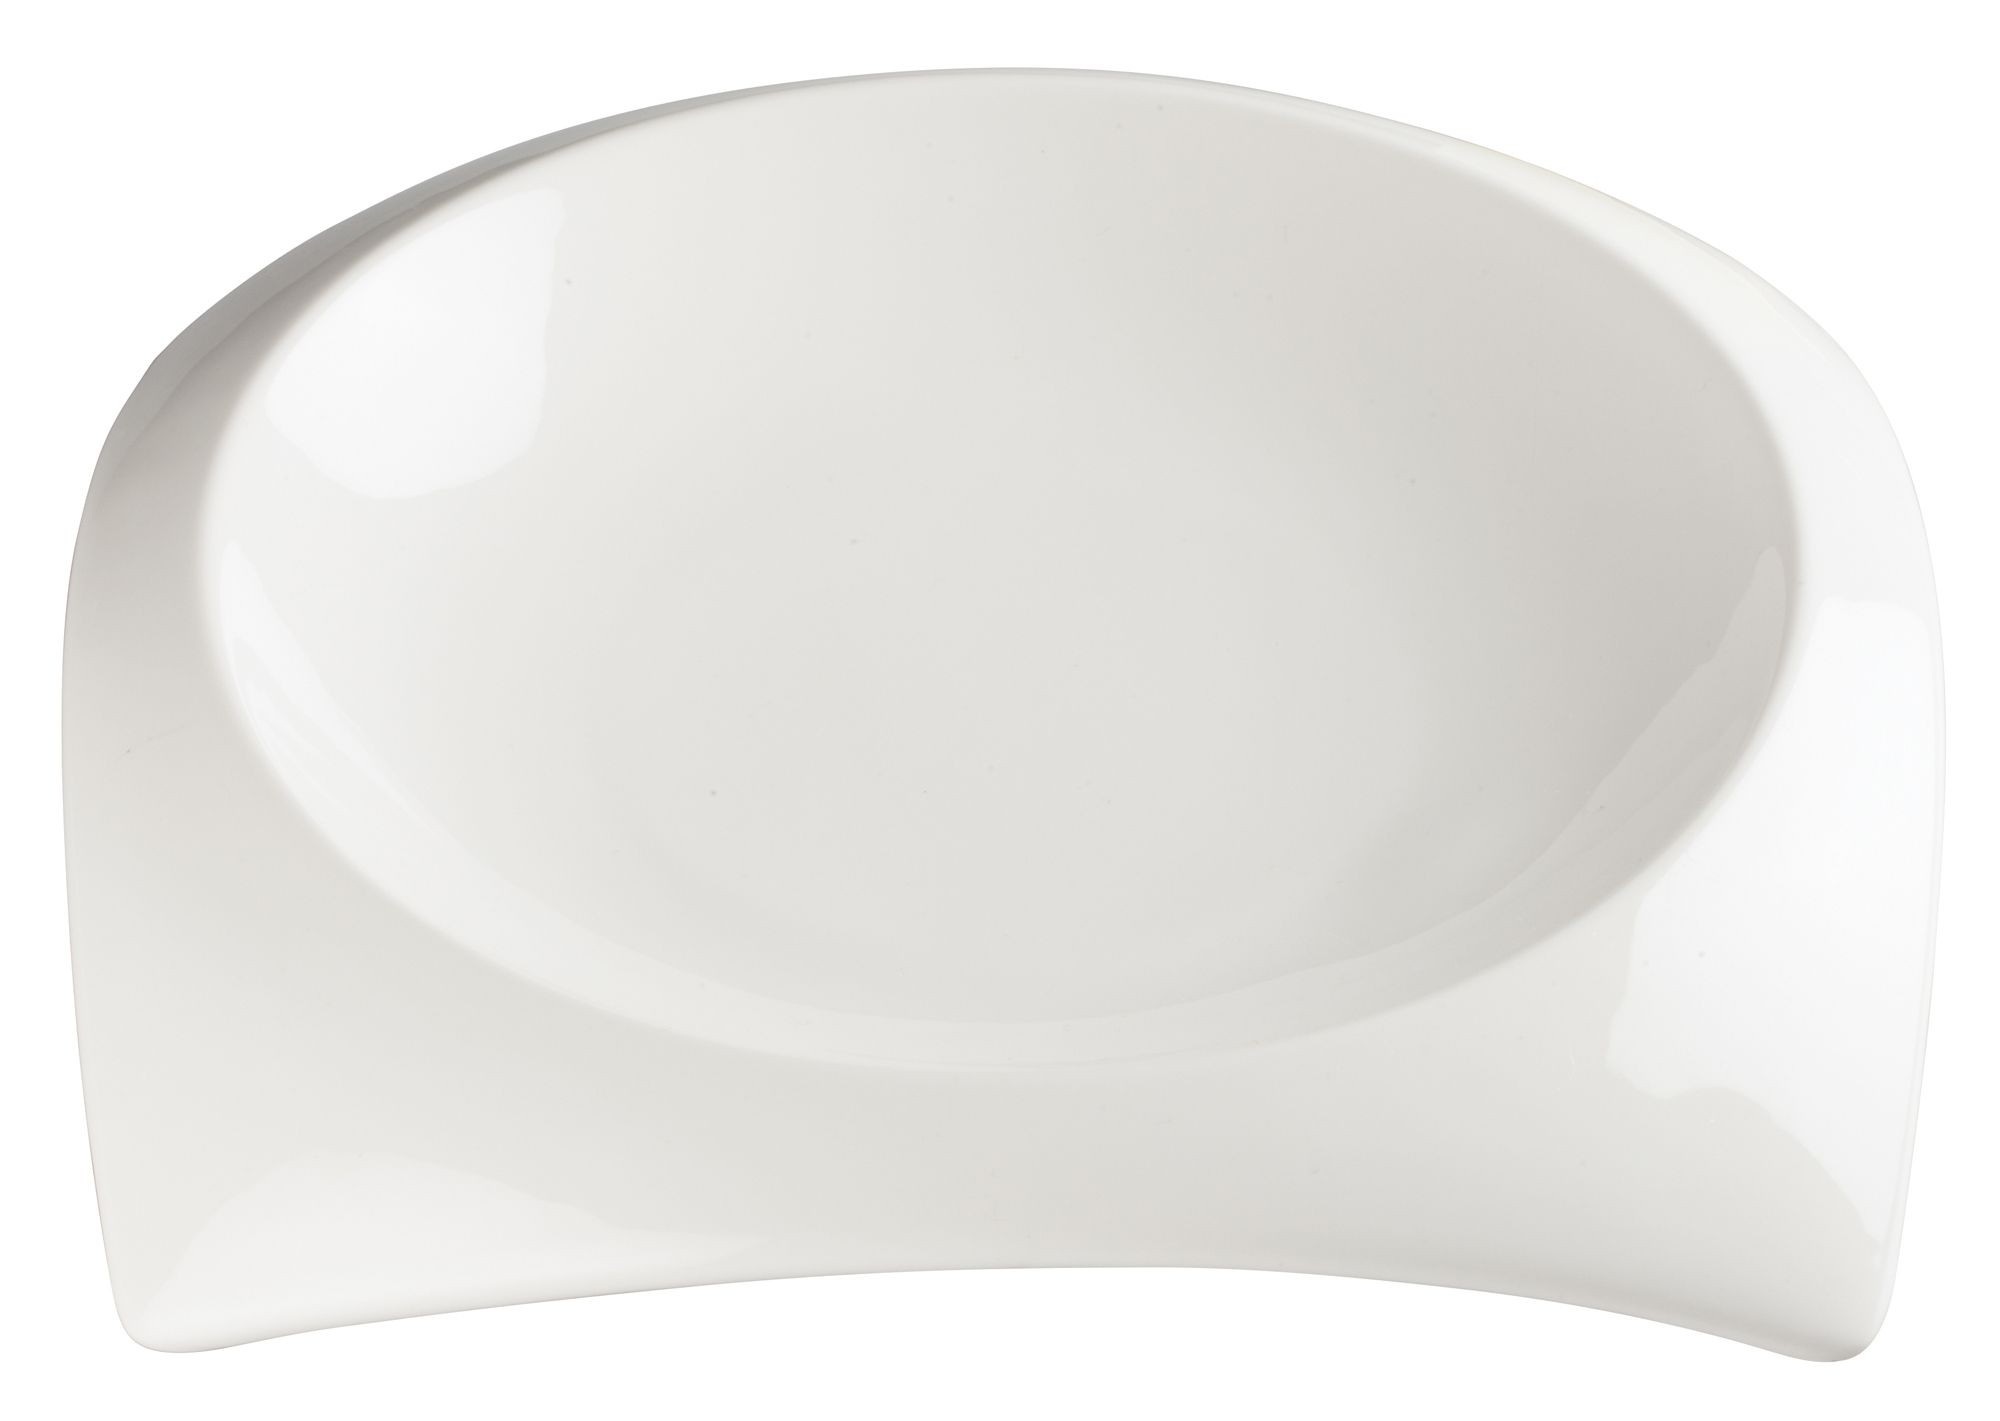 "Winco WDP005-103 Carzola Porcelain Bright White Square Deep Bowl 10"" Sq (8-1/2"" Dia)"